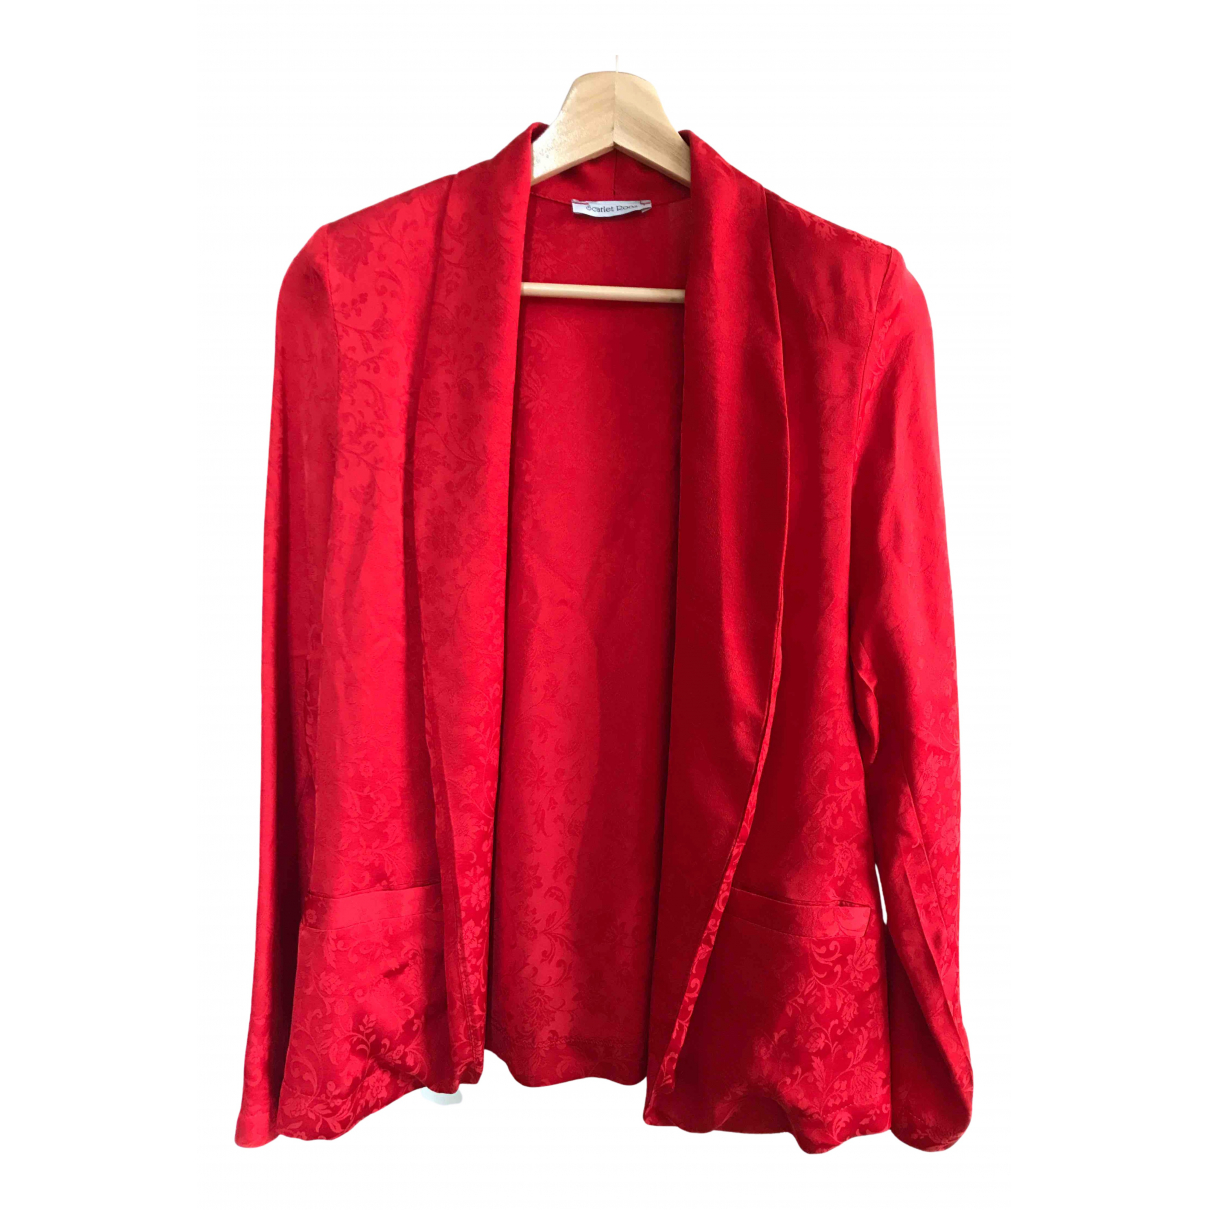 Scarlett Roos \N Jacke in  Rot Polyester